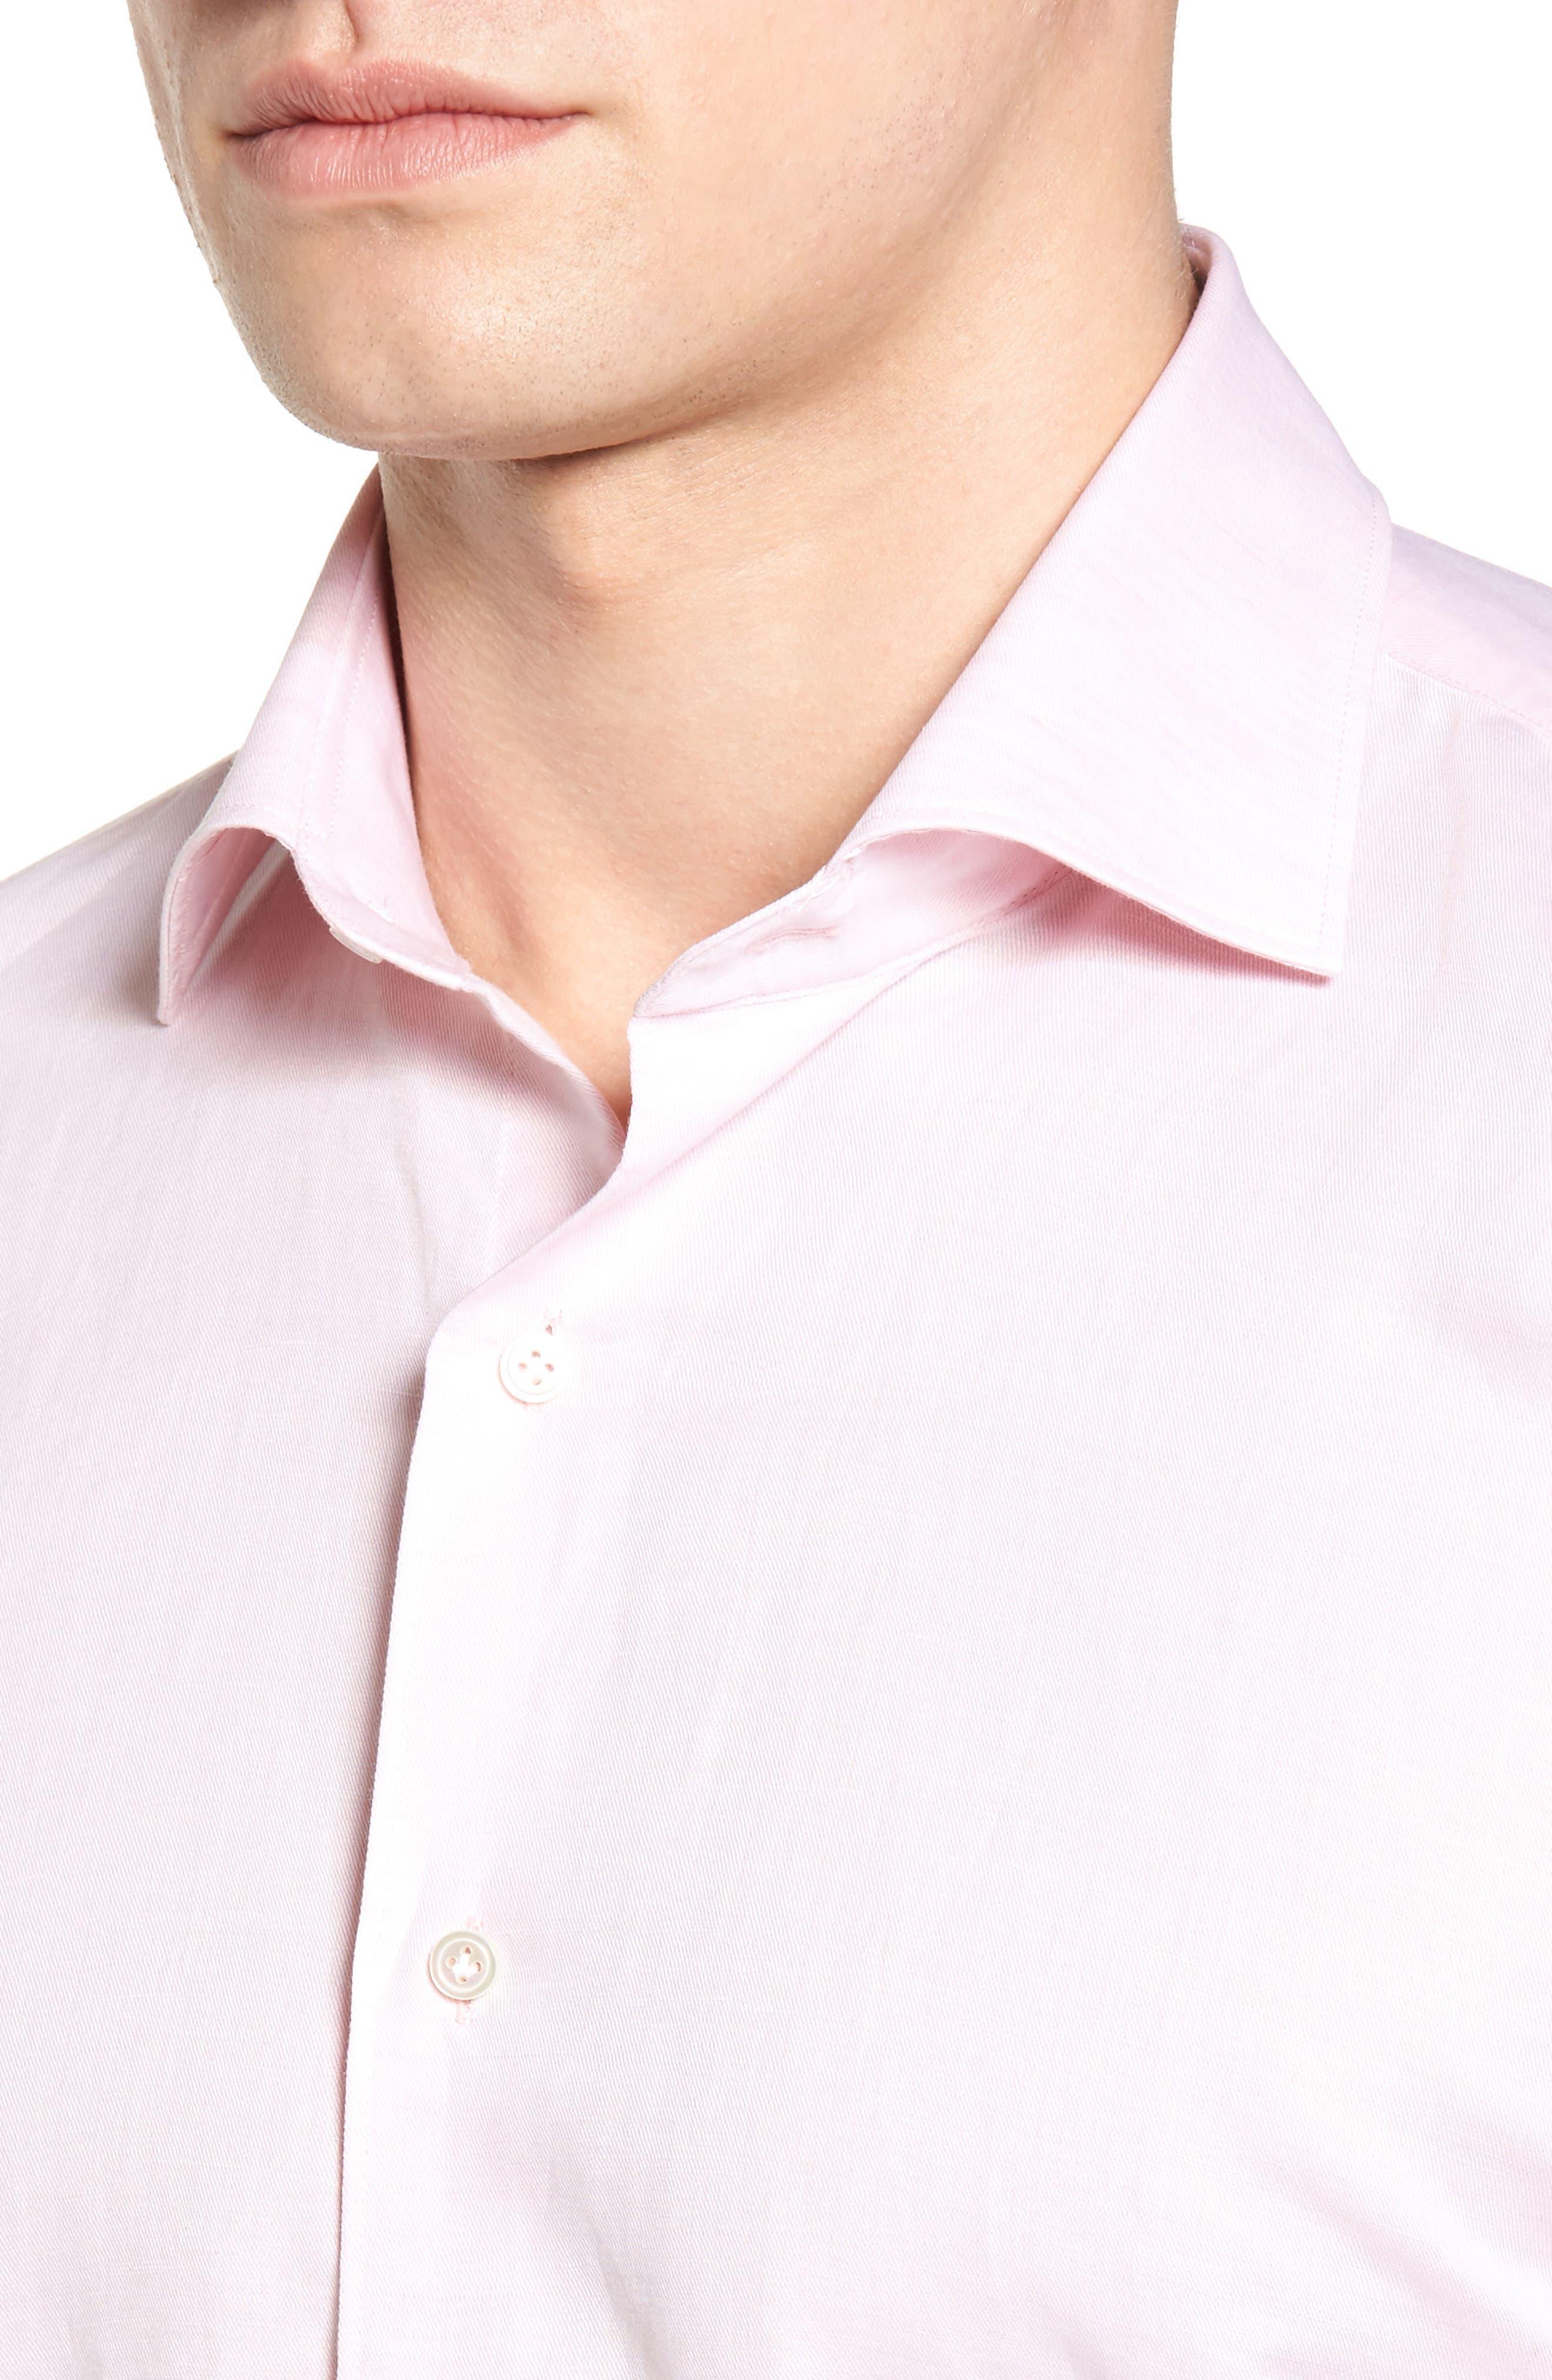 PETER MILLAR COLLECTION,                             Linen & Cotton Sport Shirt,                             Alternate thumbnail 4, color,                             626